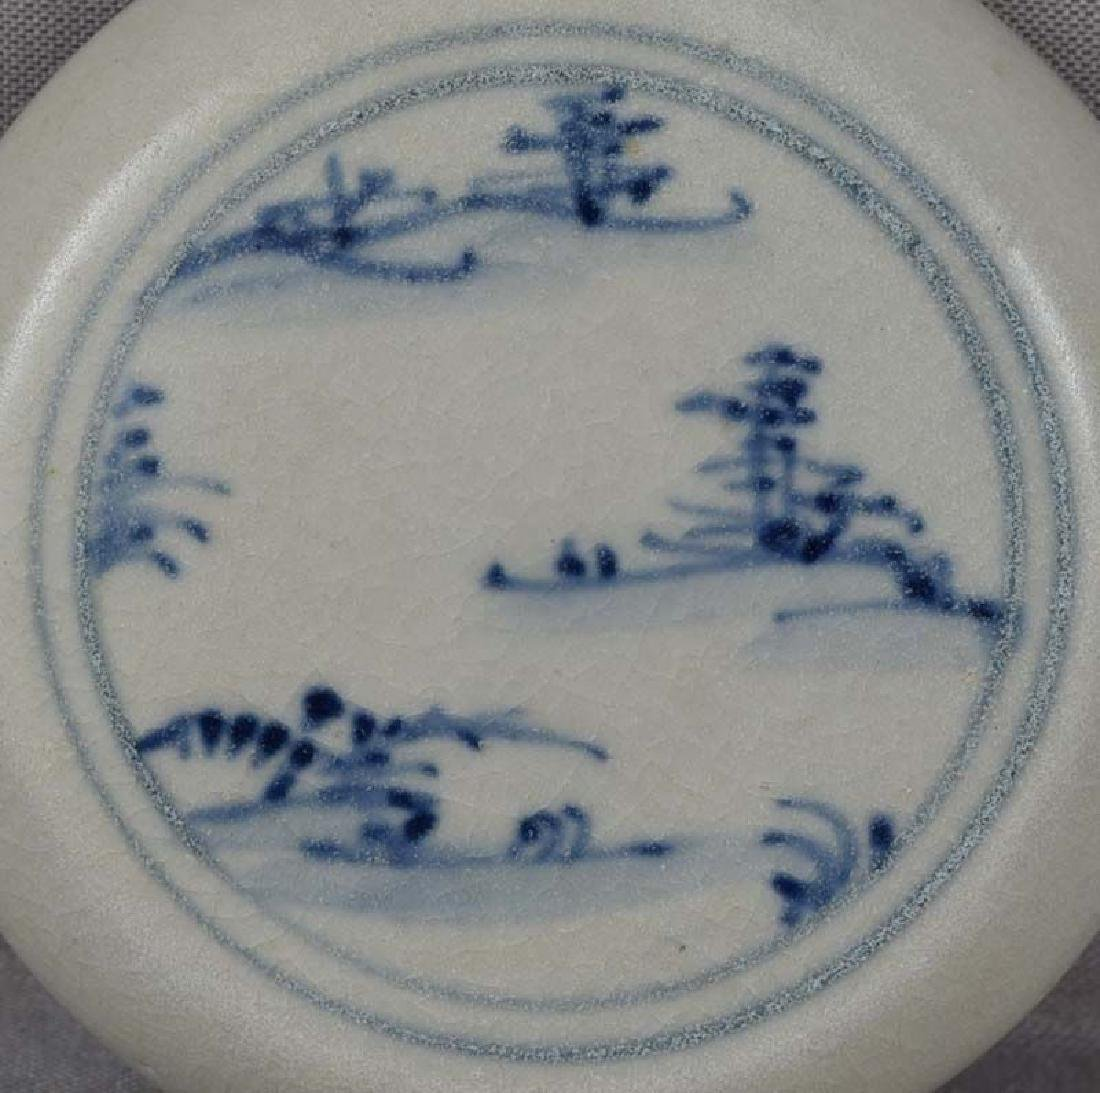 Antique Vietnamese Ceramic Hoi an Shipwreck Box, 15th C - 2